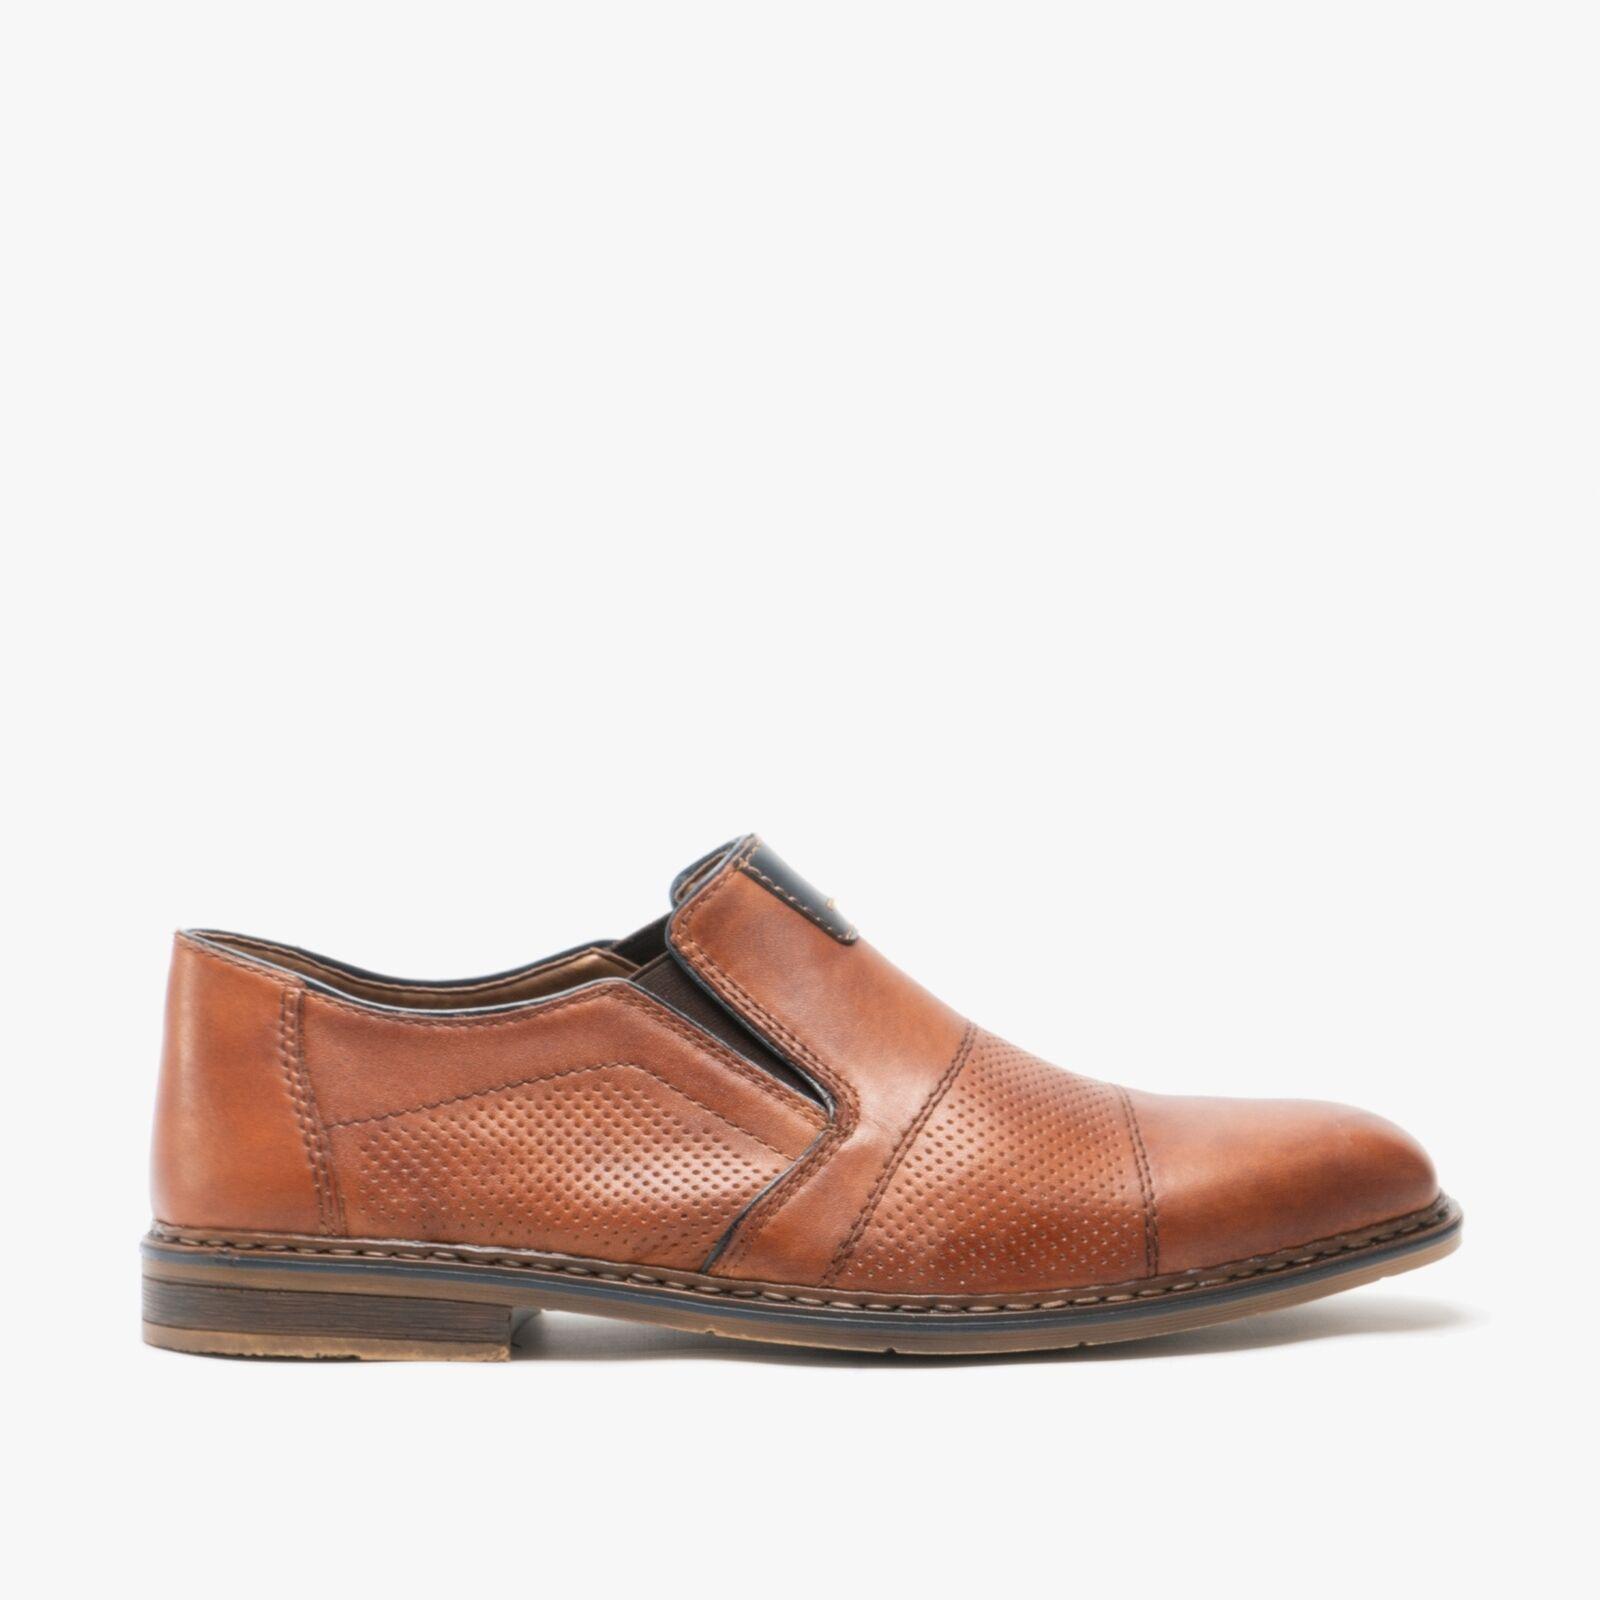 Rieker B1765 - 24 Amaretto (brown) Mens